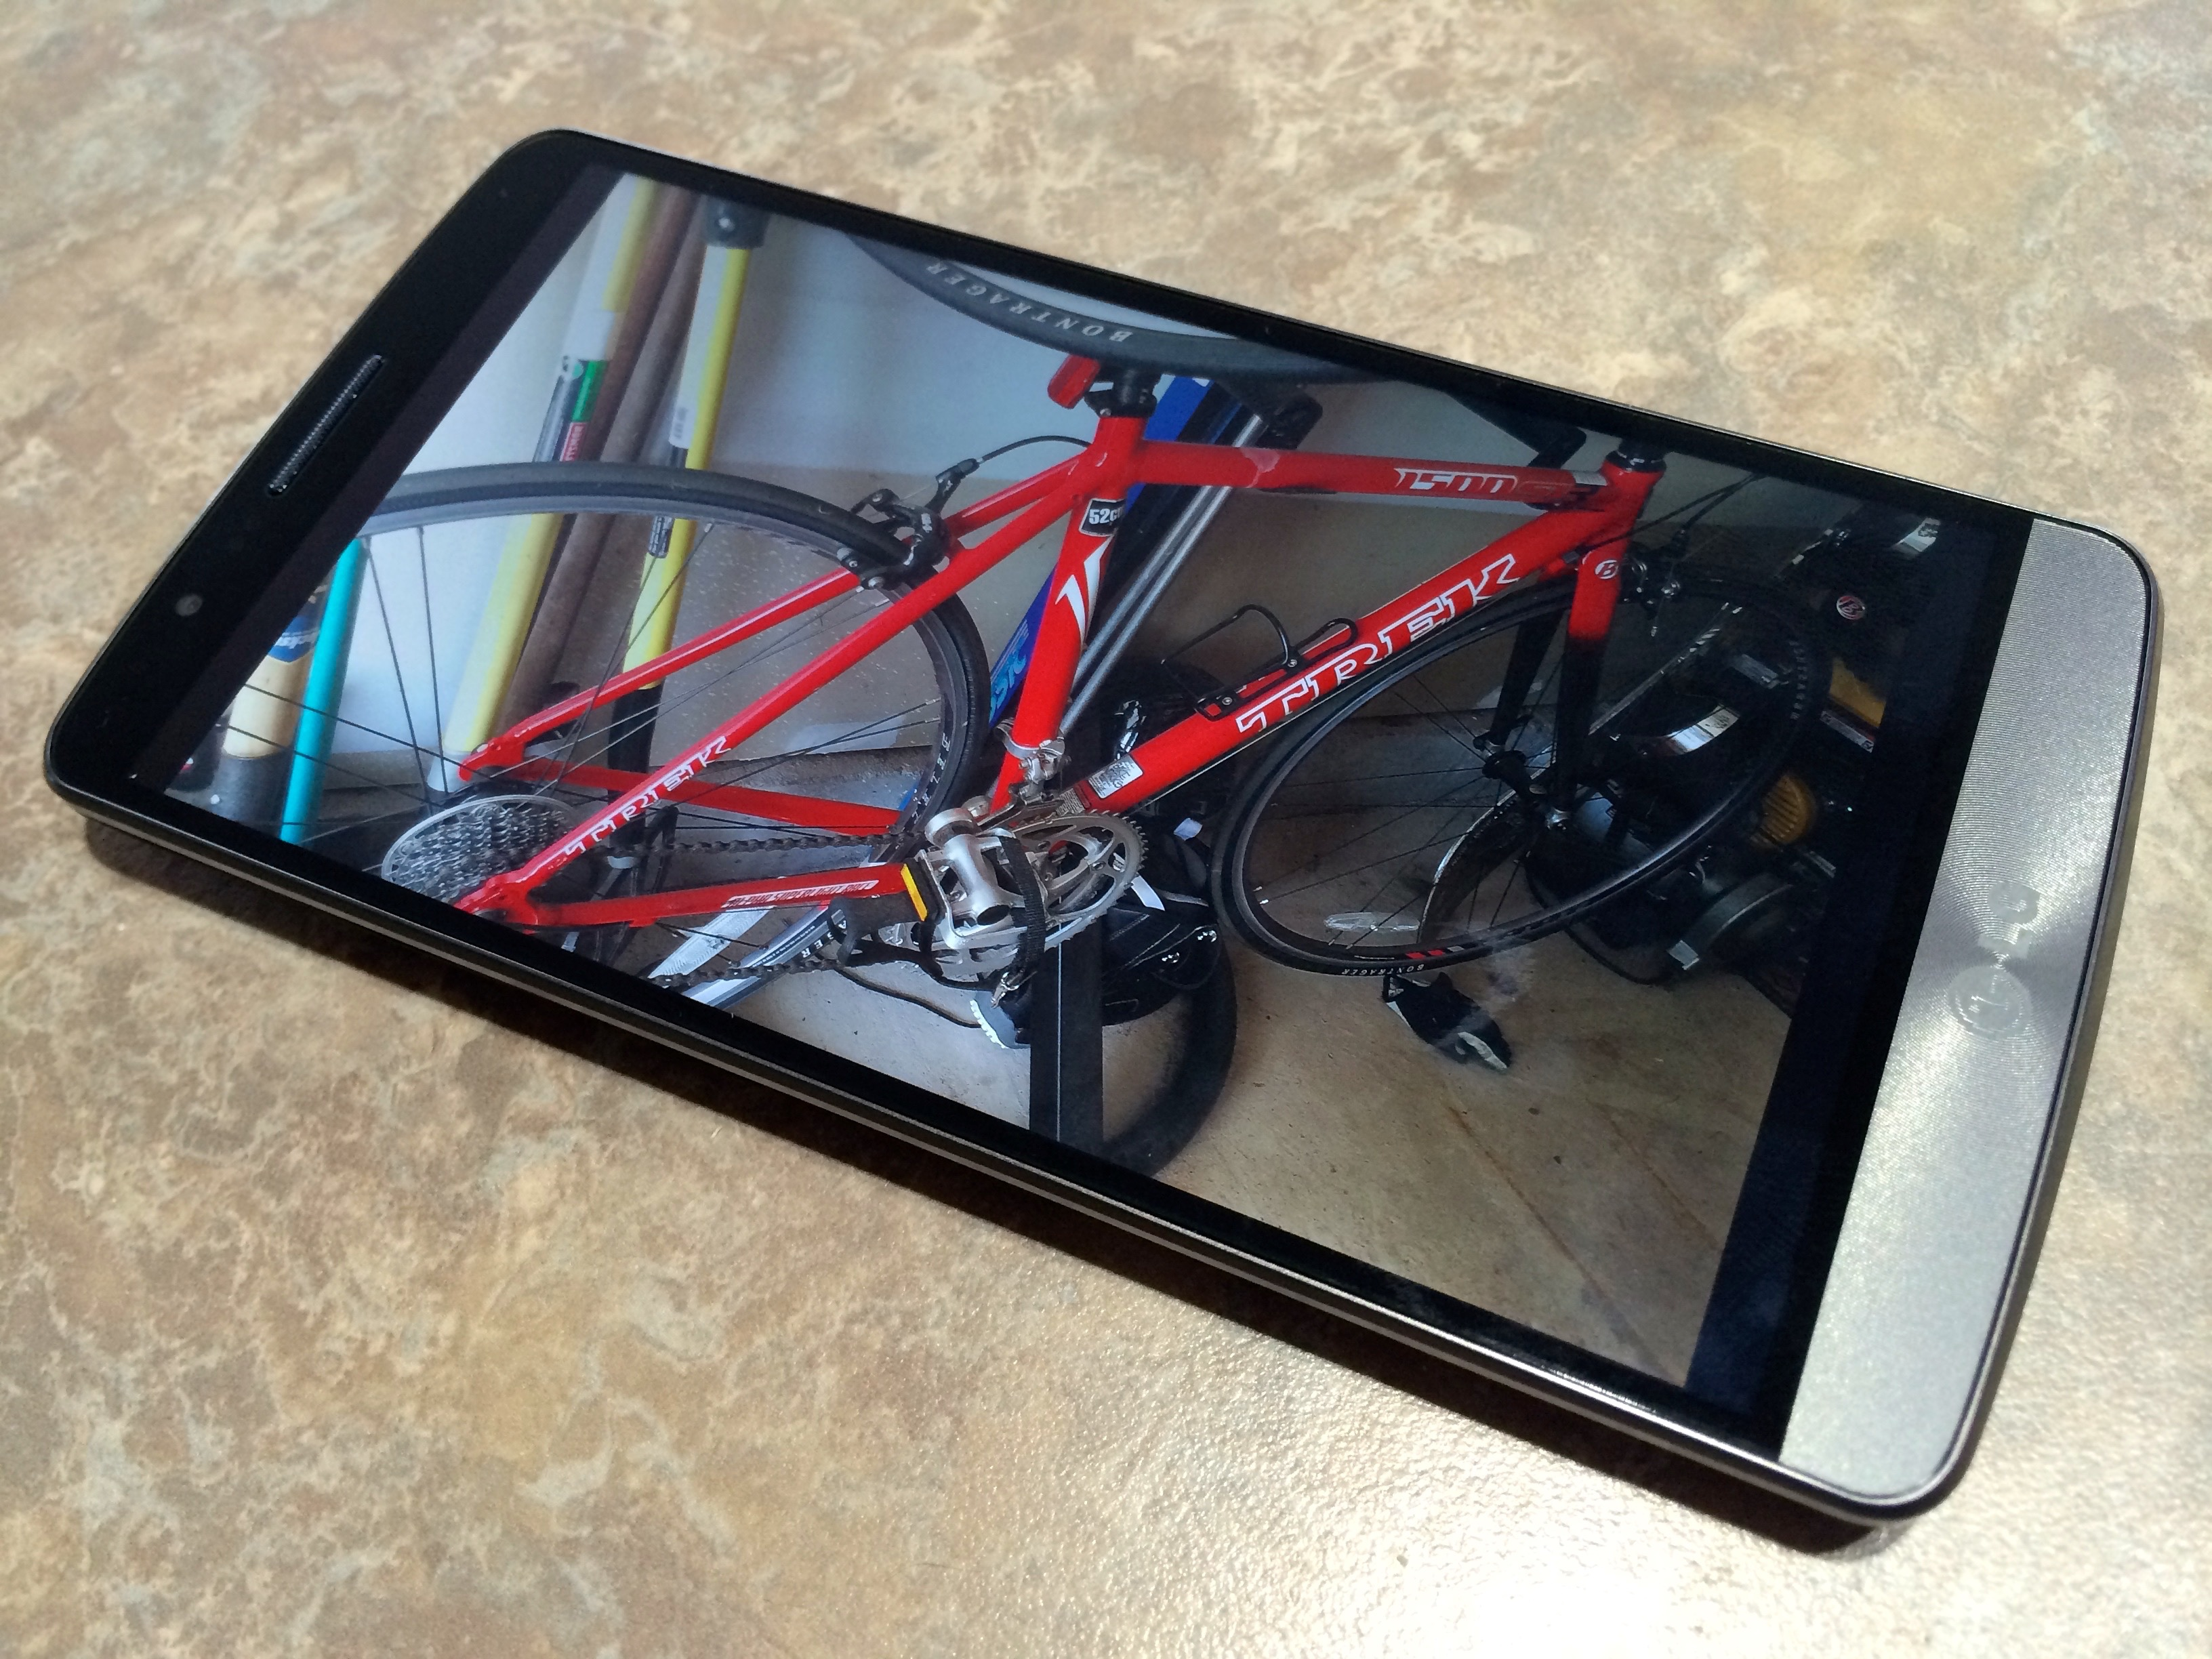 LG G3 display